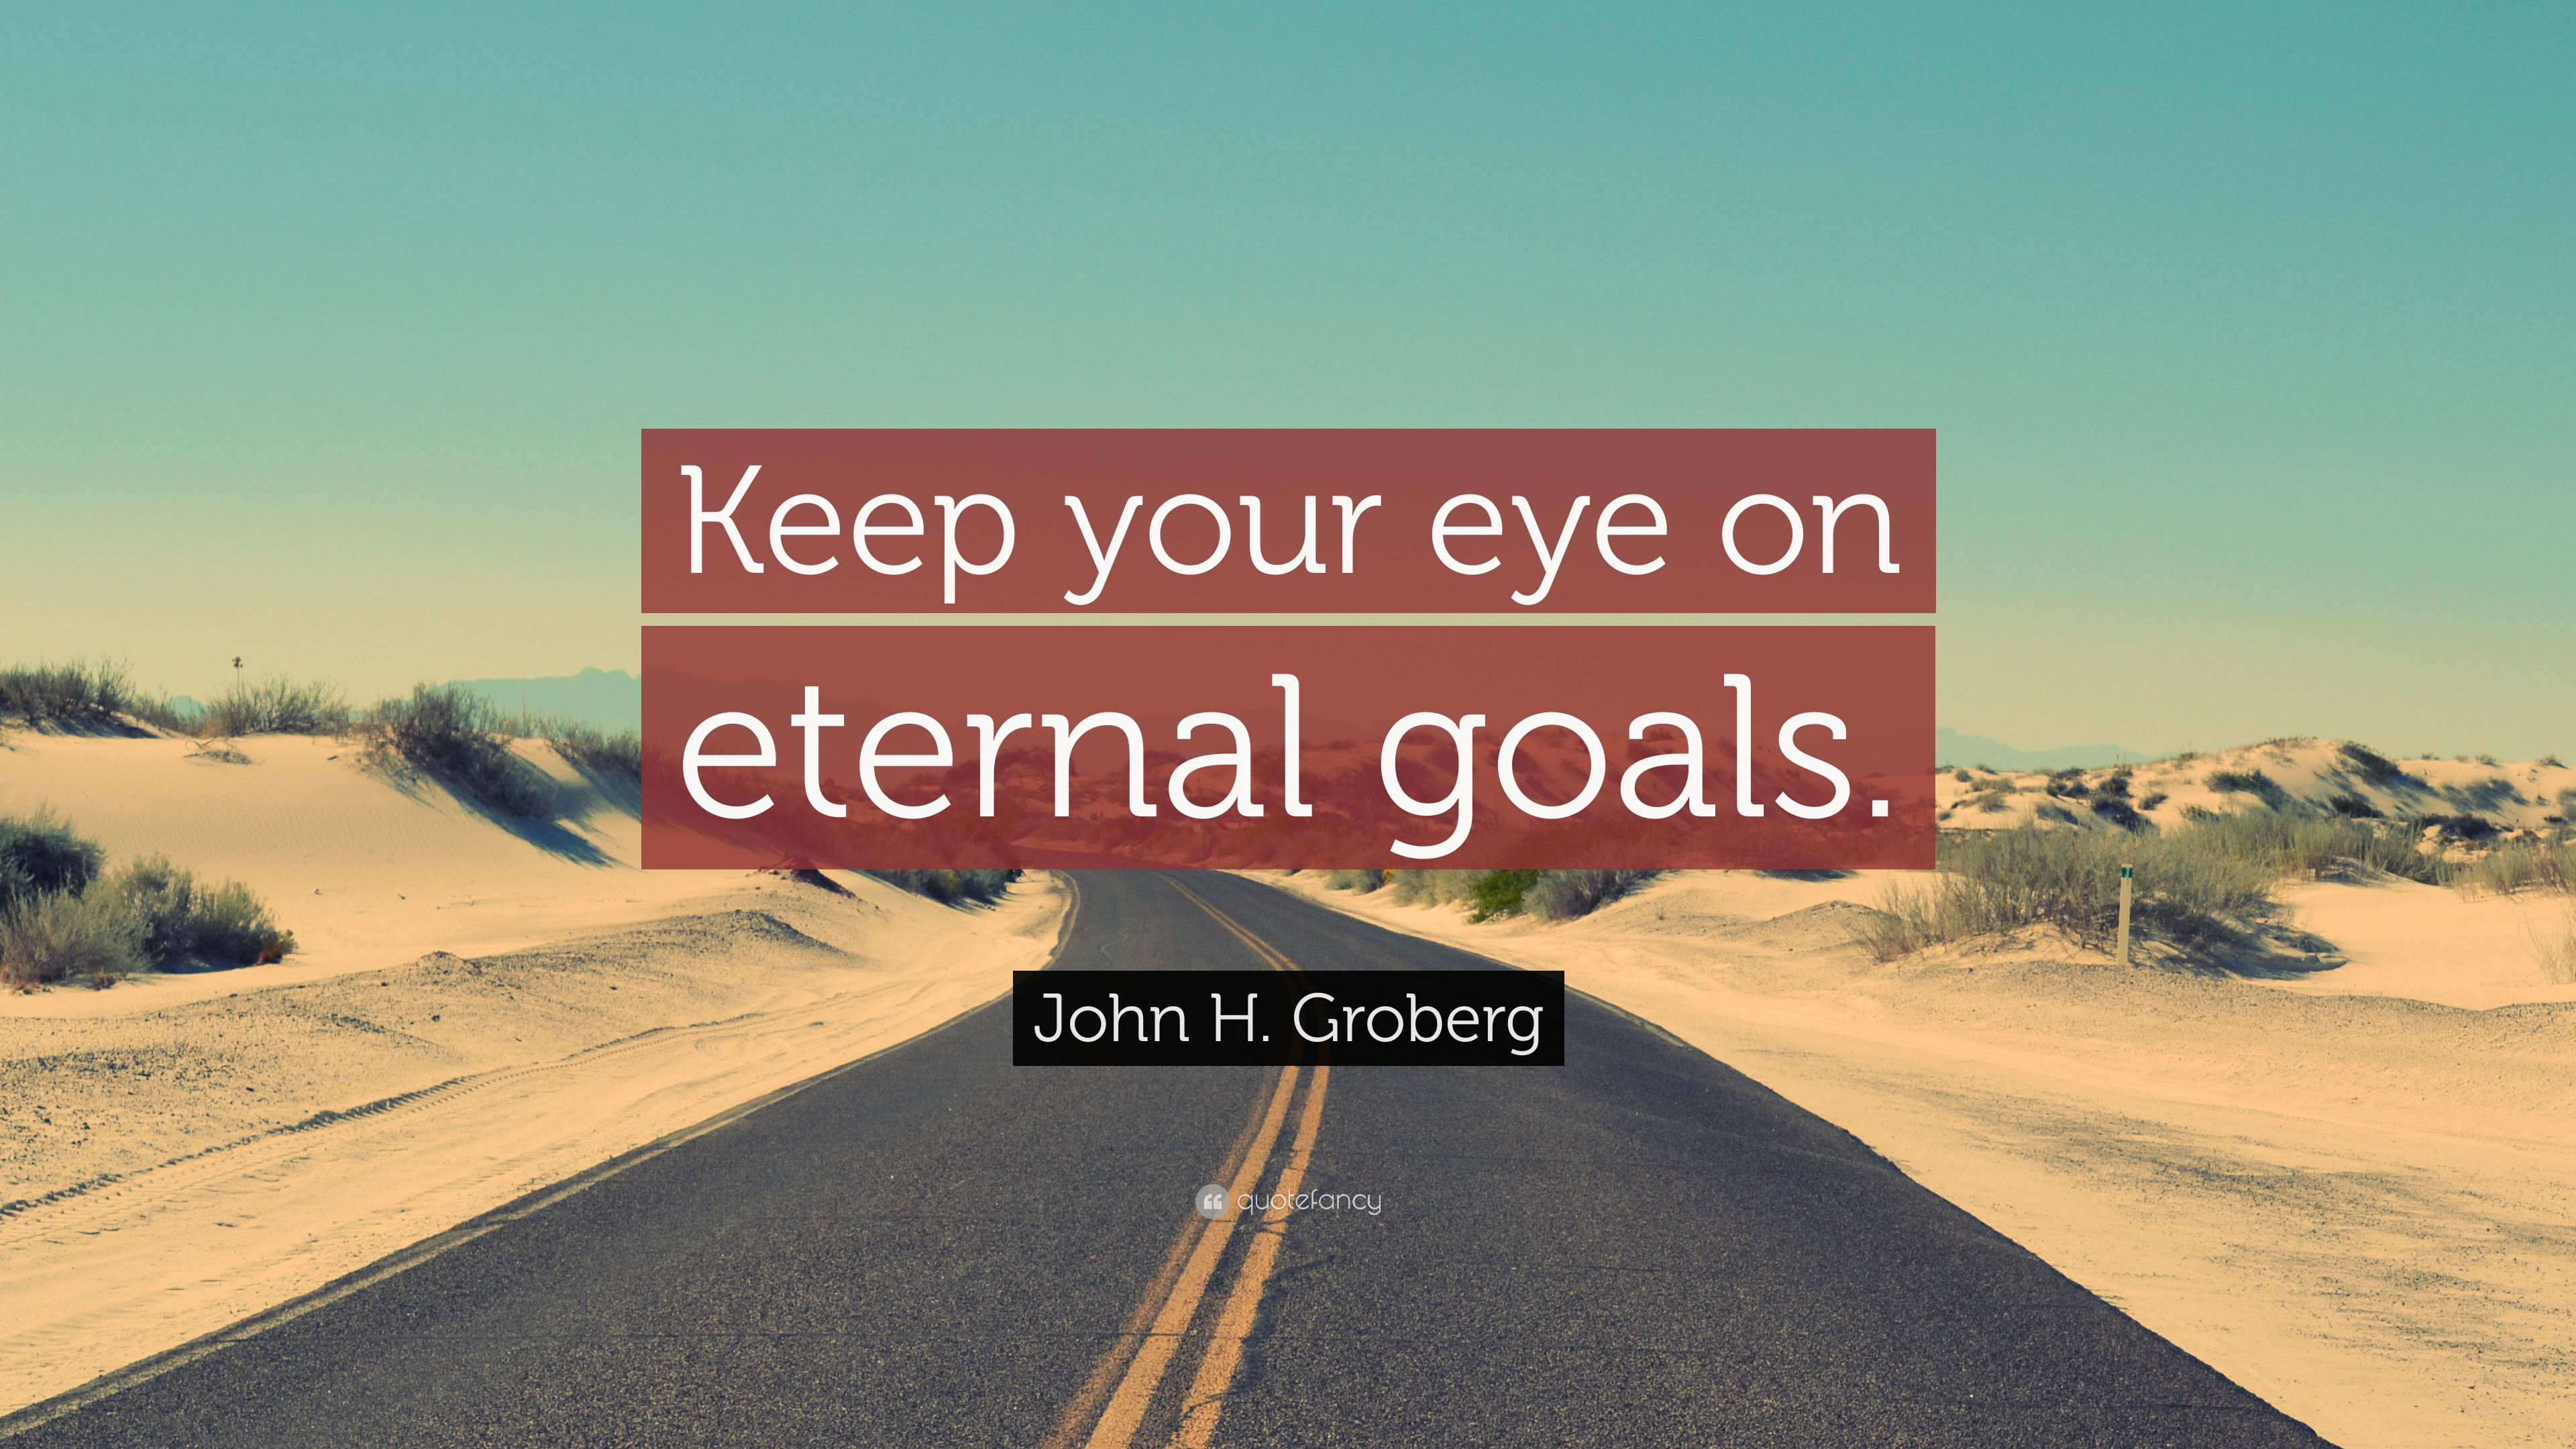 john groberg quotes